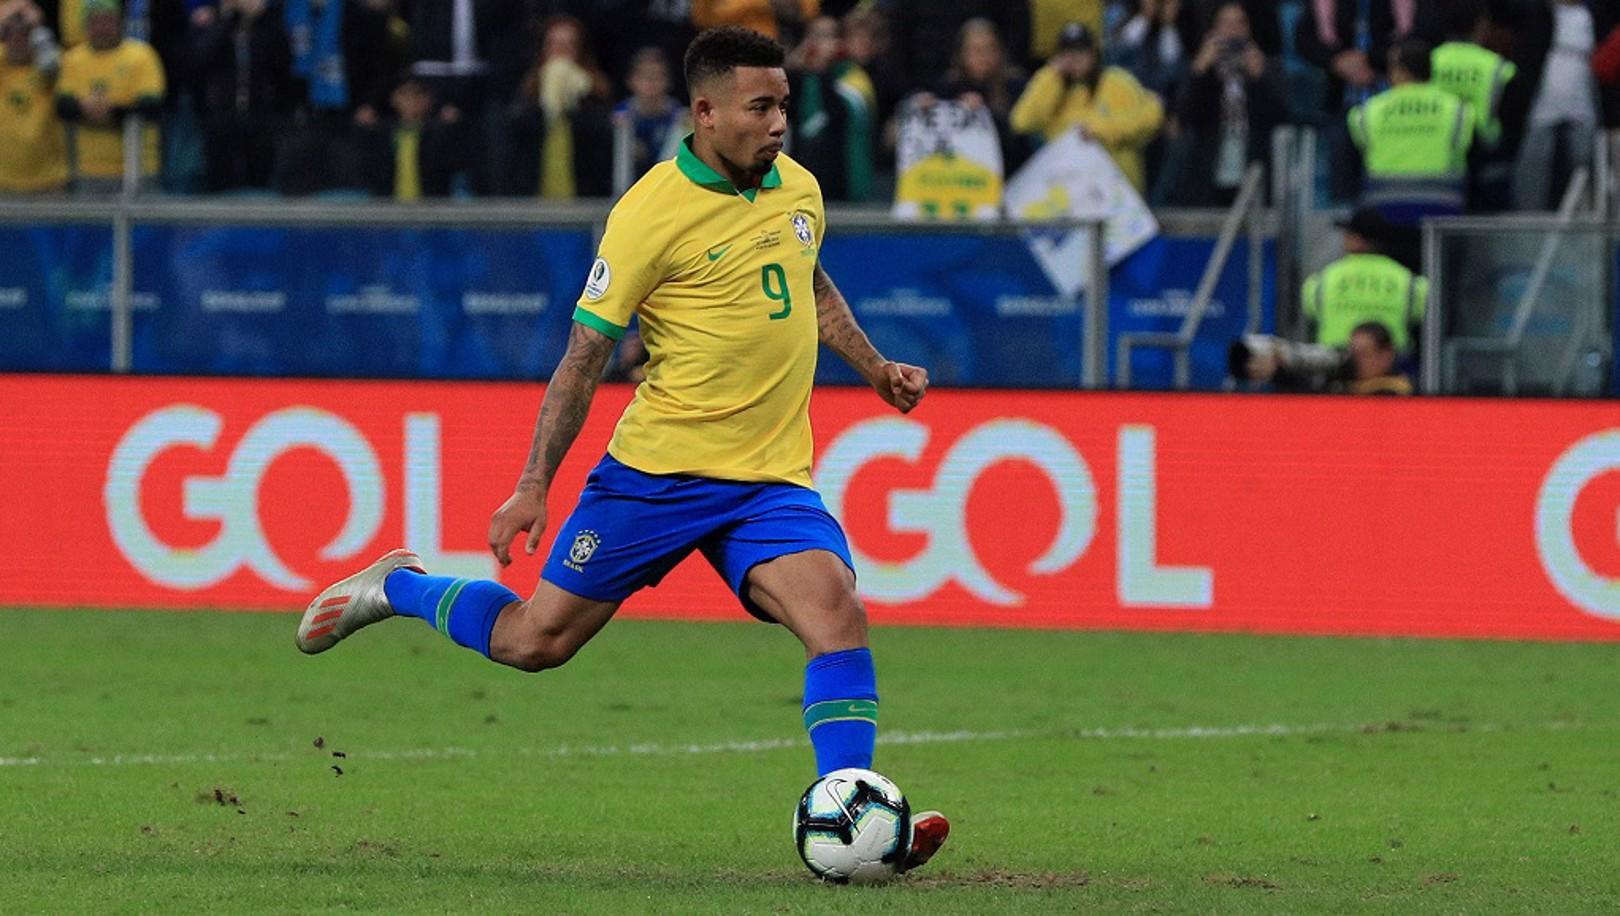 Jesus converte último pênalti e Brasil avança